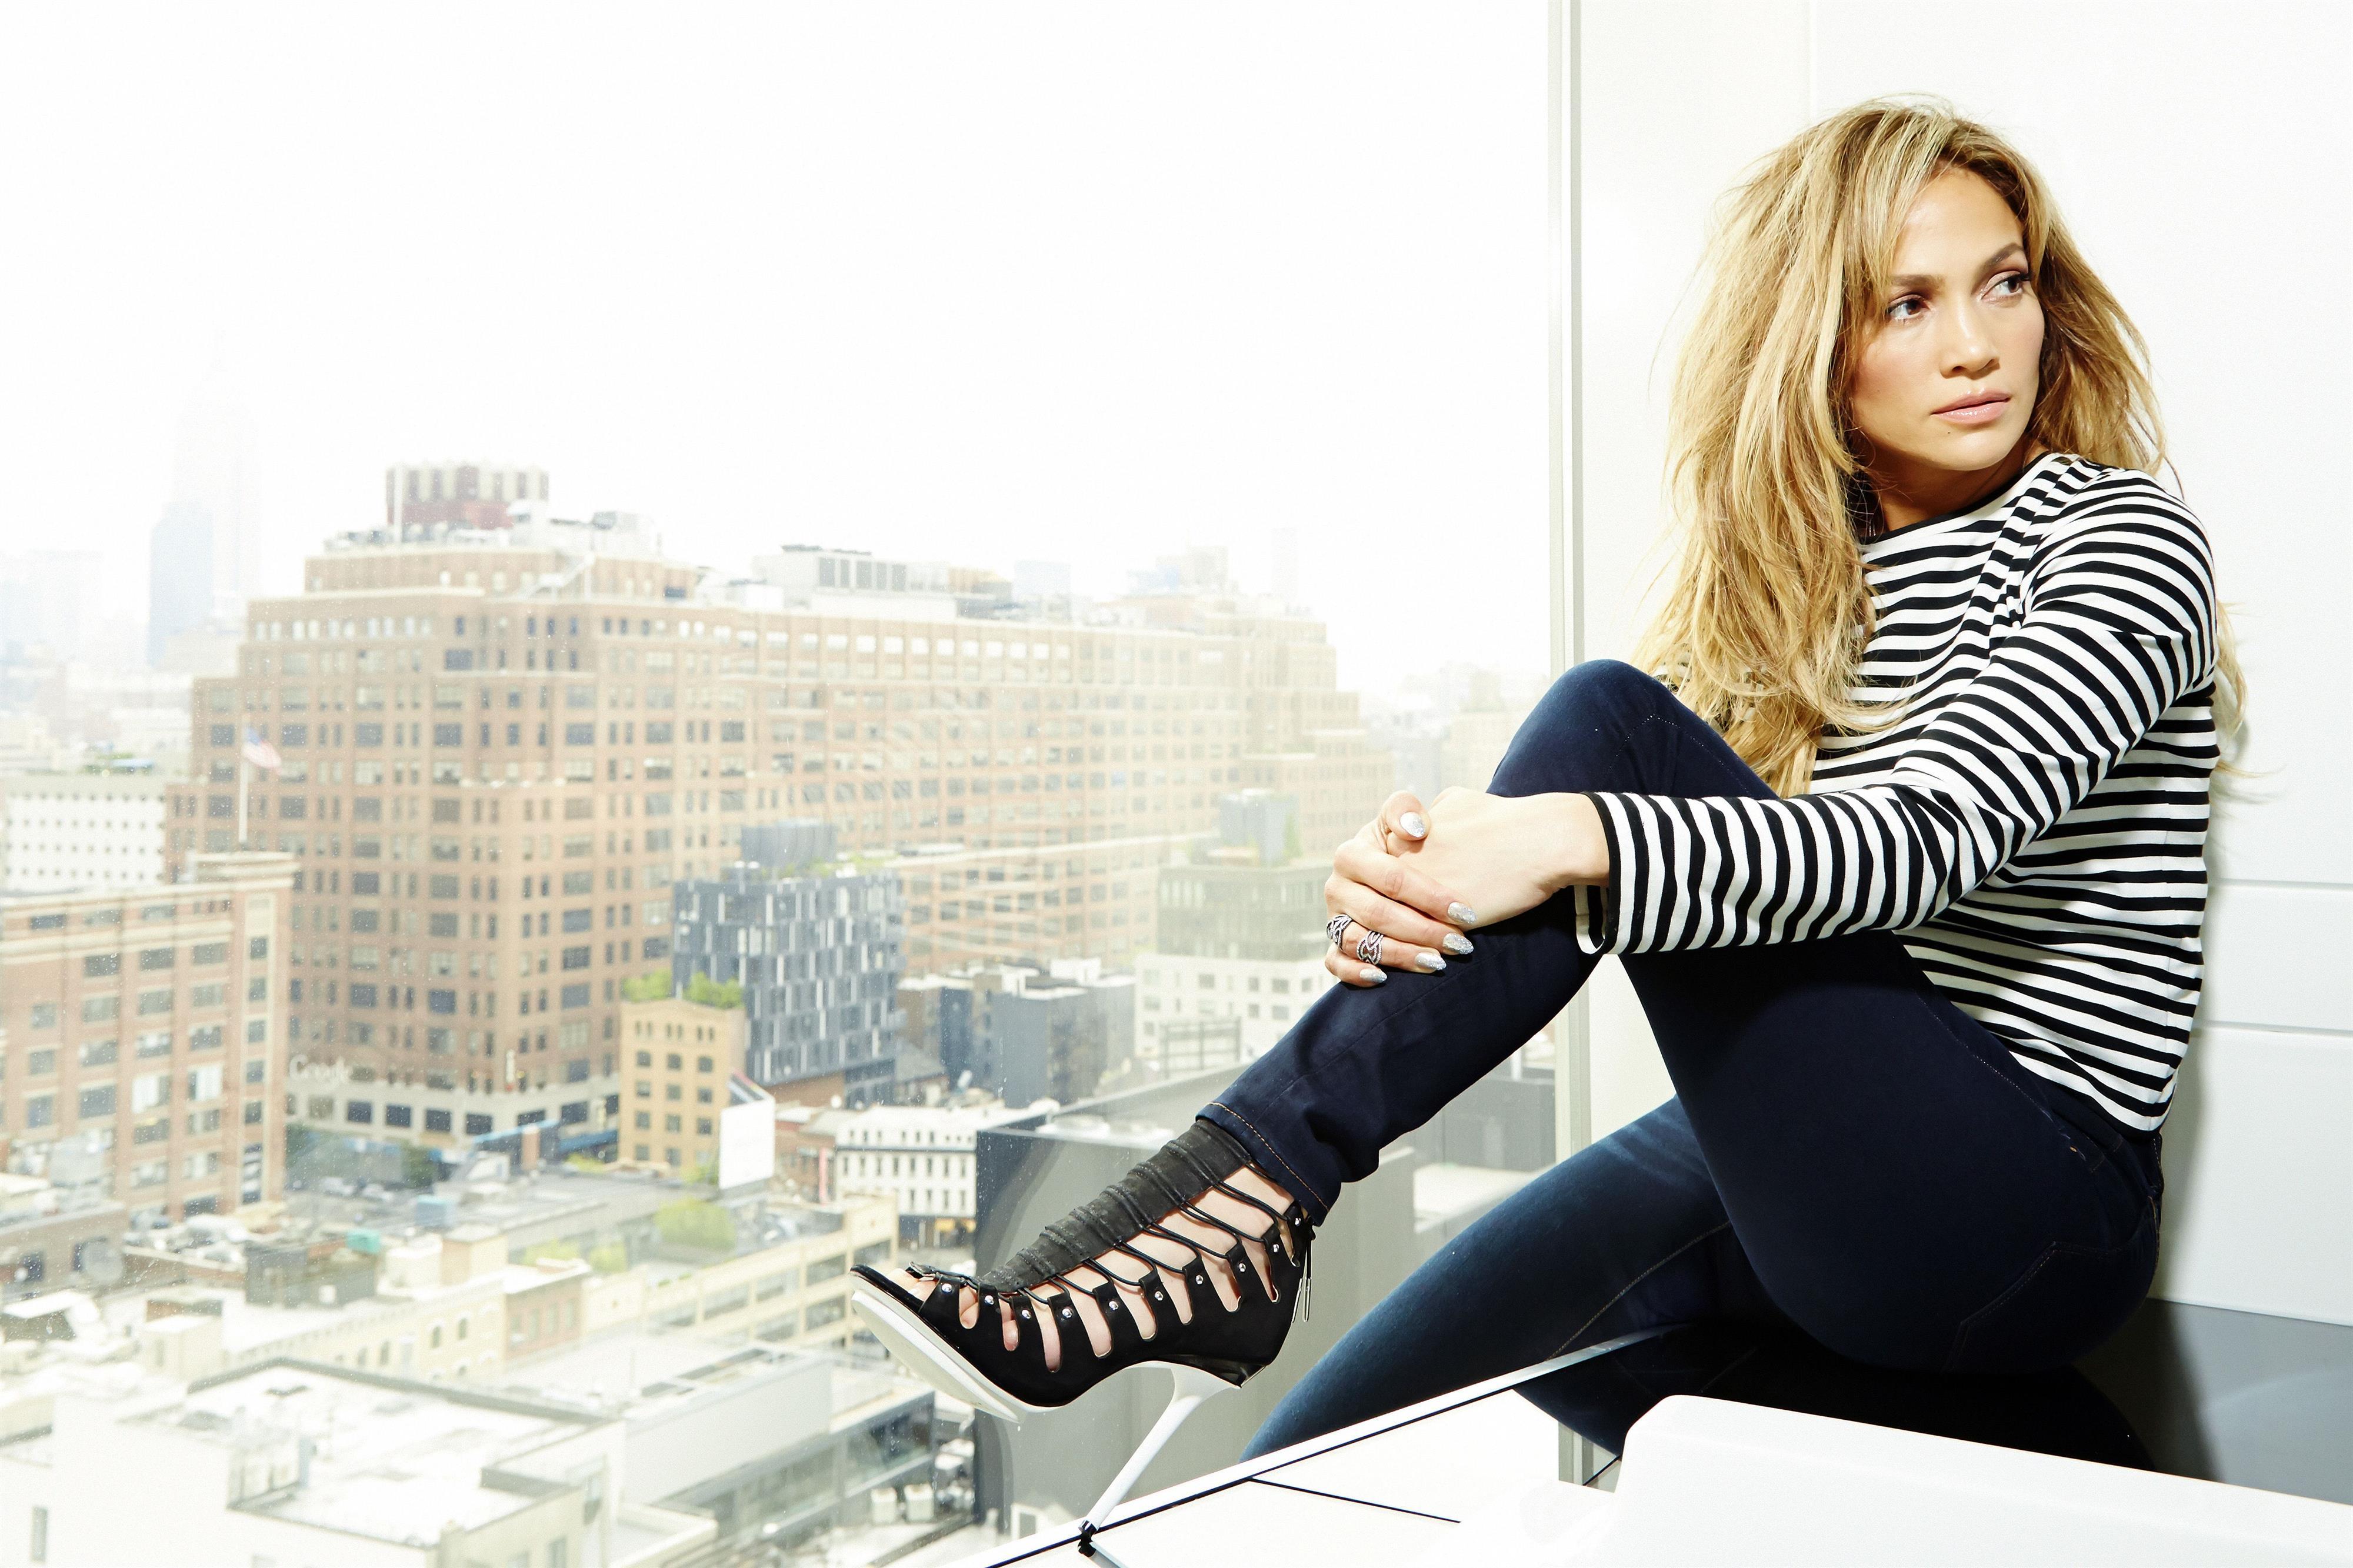 Jennifer Lopez portrait session for AKA at the Standard High Line Hotel, NYC June 10, 2014